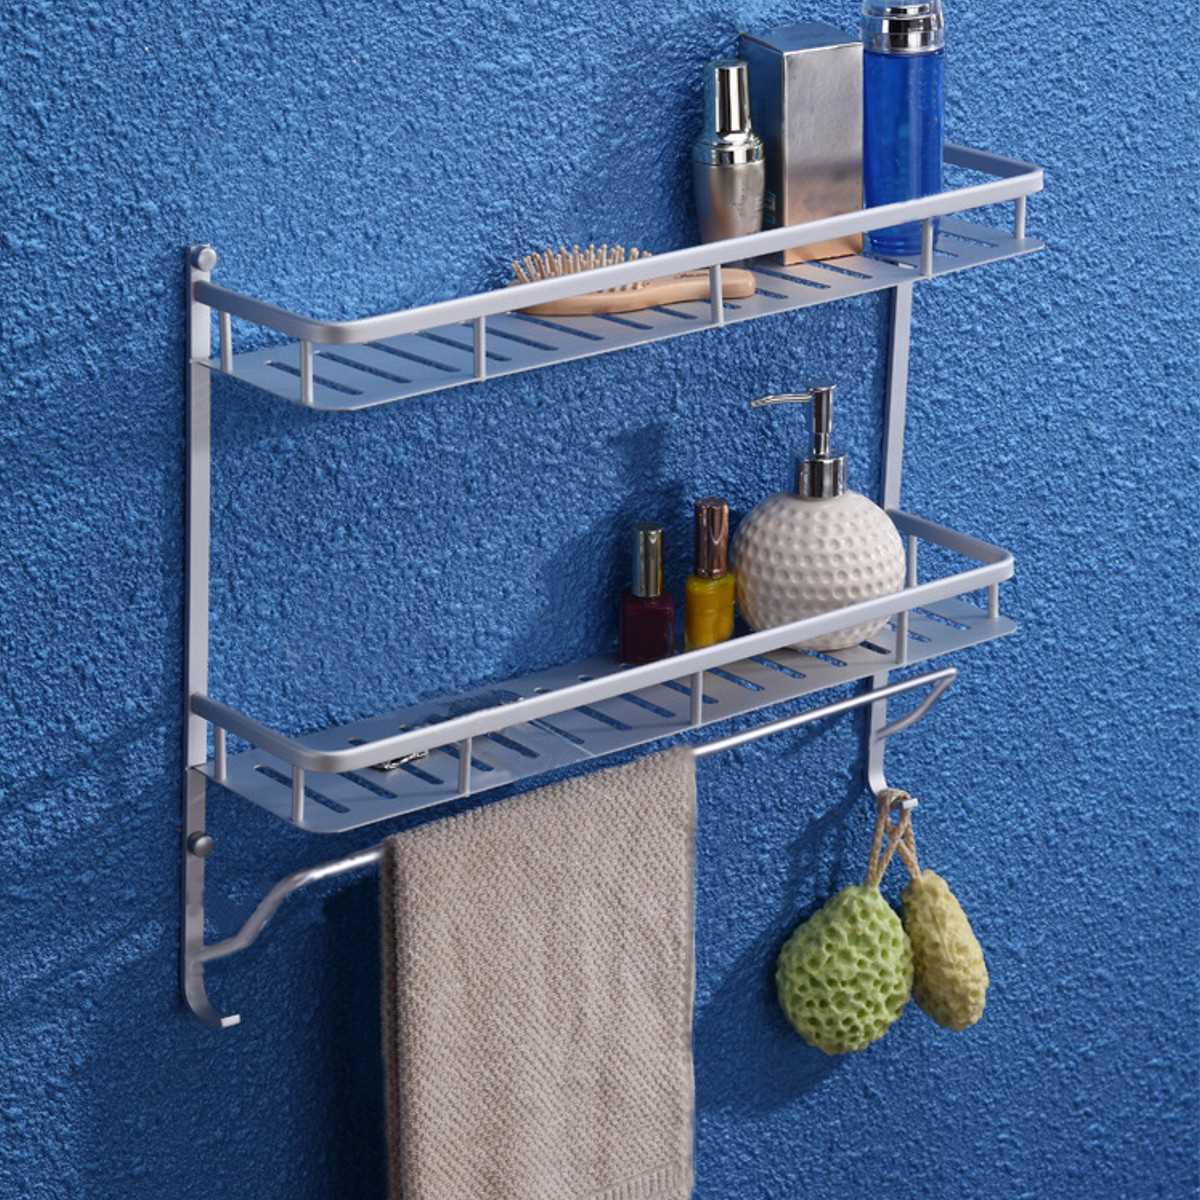 Kitchen Bathroom Storage Rack Shelf 1/2 Layer Space Saver Aluminium ...